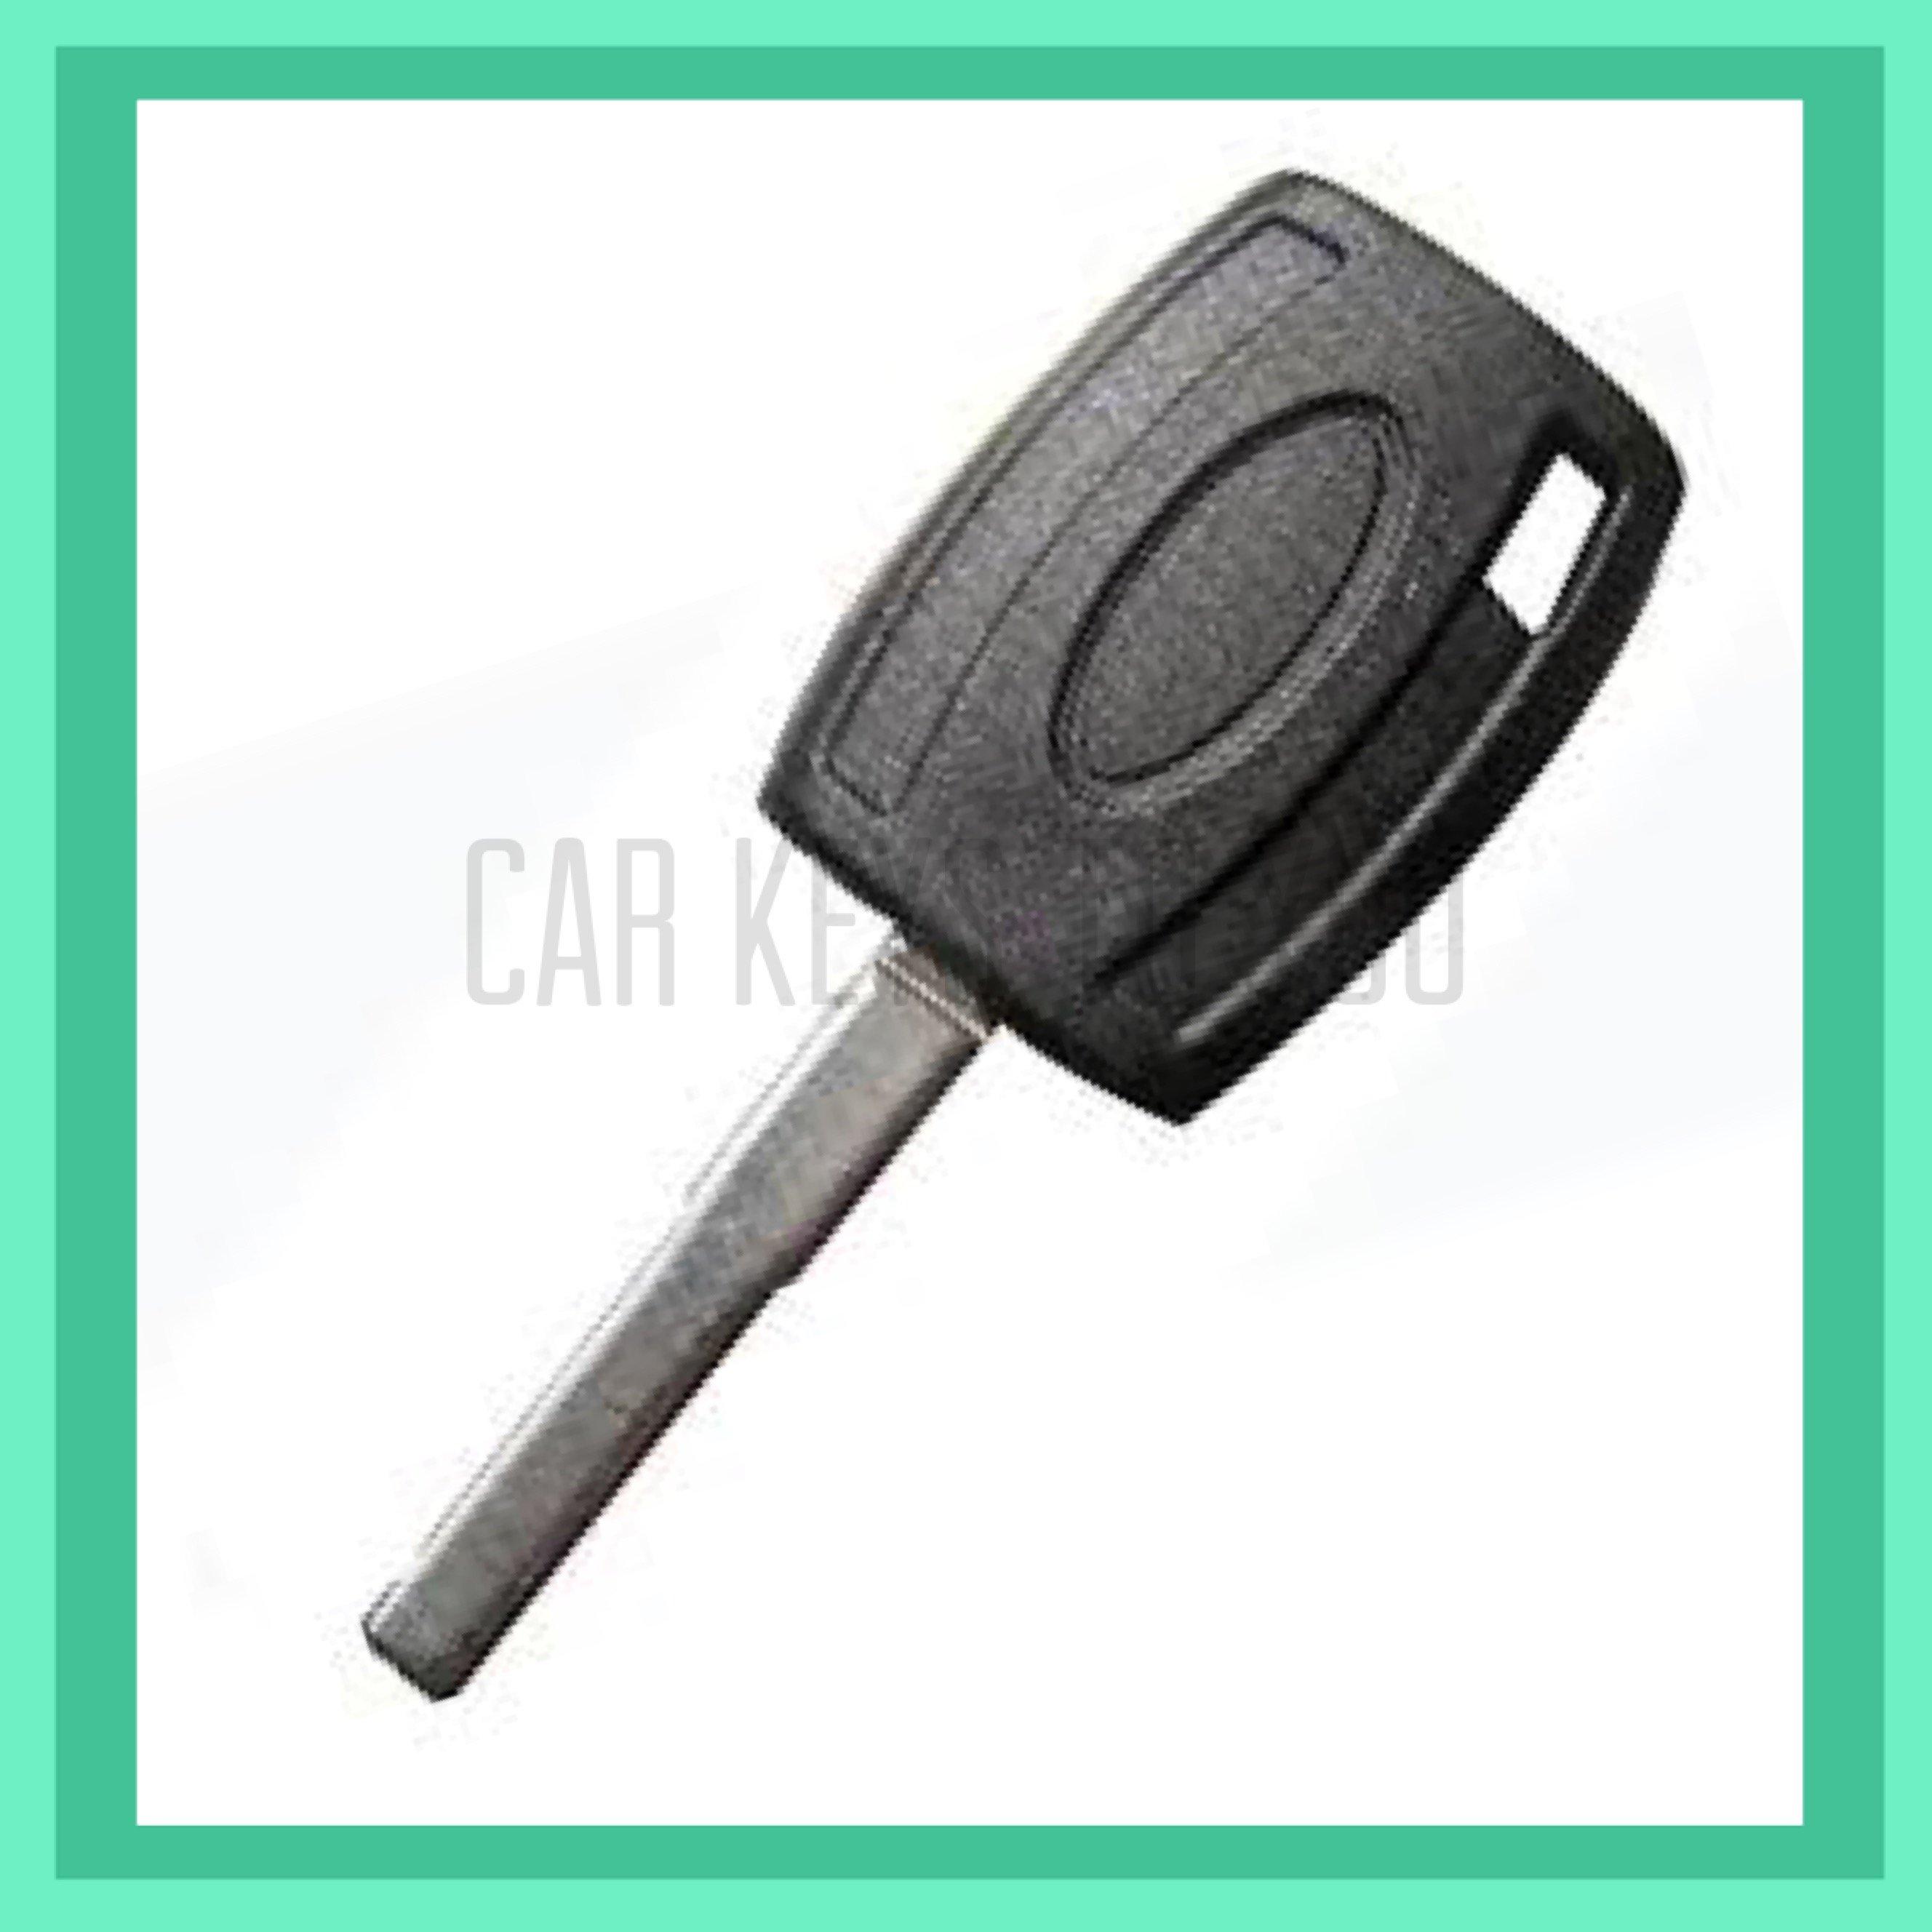 Mazda BT50 Car Key and Remot, Suit B32P/Q 2011 - 2015